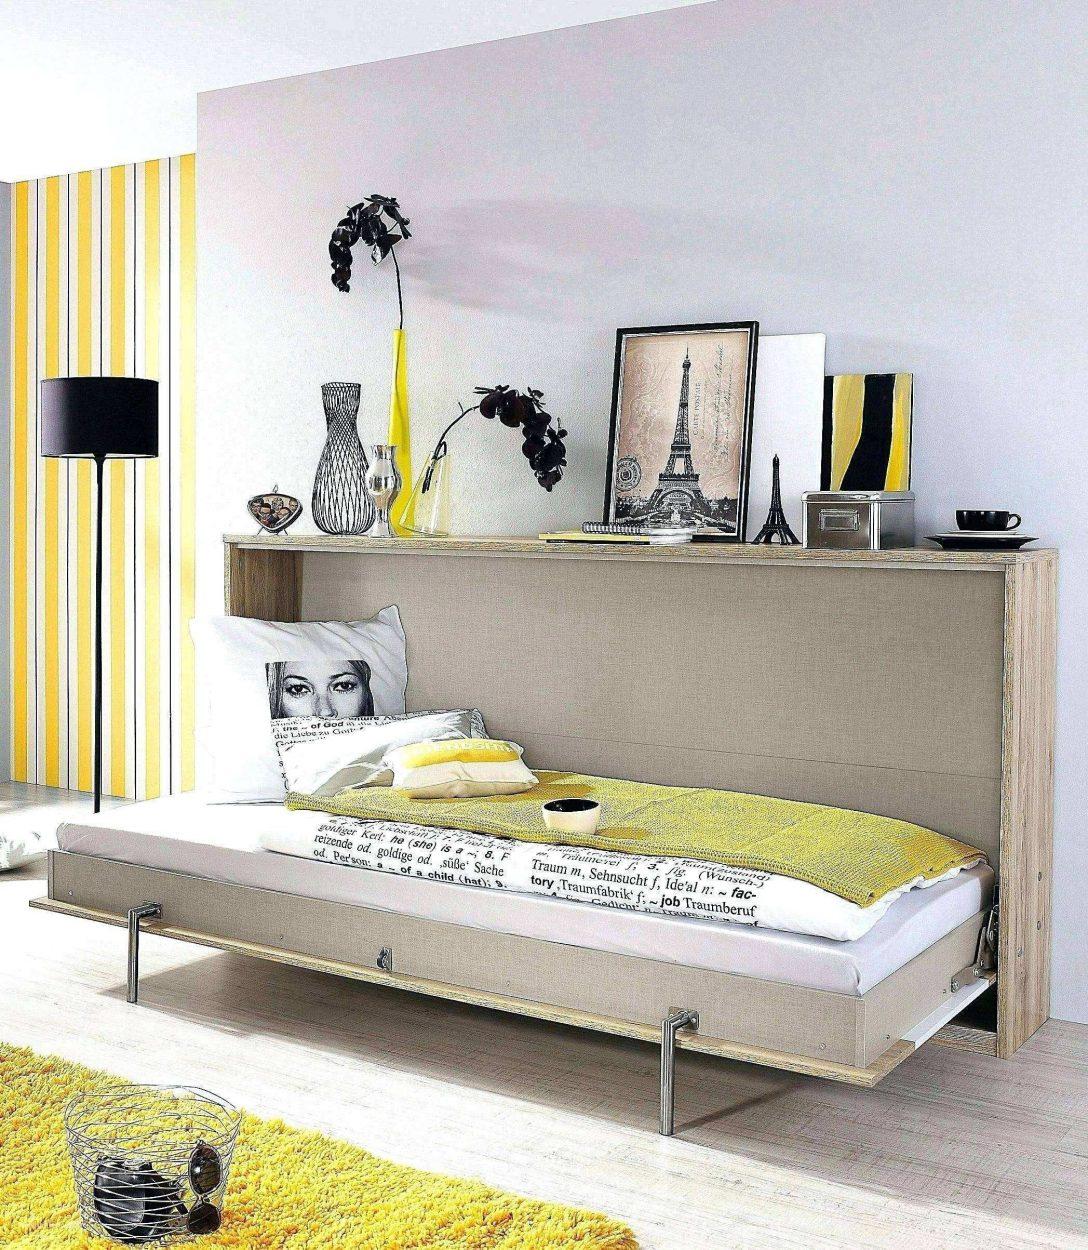 Large Size of Betten Bei Ikea 39 E0 Bett 200x200 Fhrung Boxspring Oschmann Billige Ruf Fabrikverkauf Amazon 180x200 Kaufen überlänge Mit Schubladen Konzentrationsschwäche Bett Betten Bei Ikea